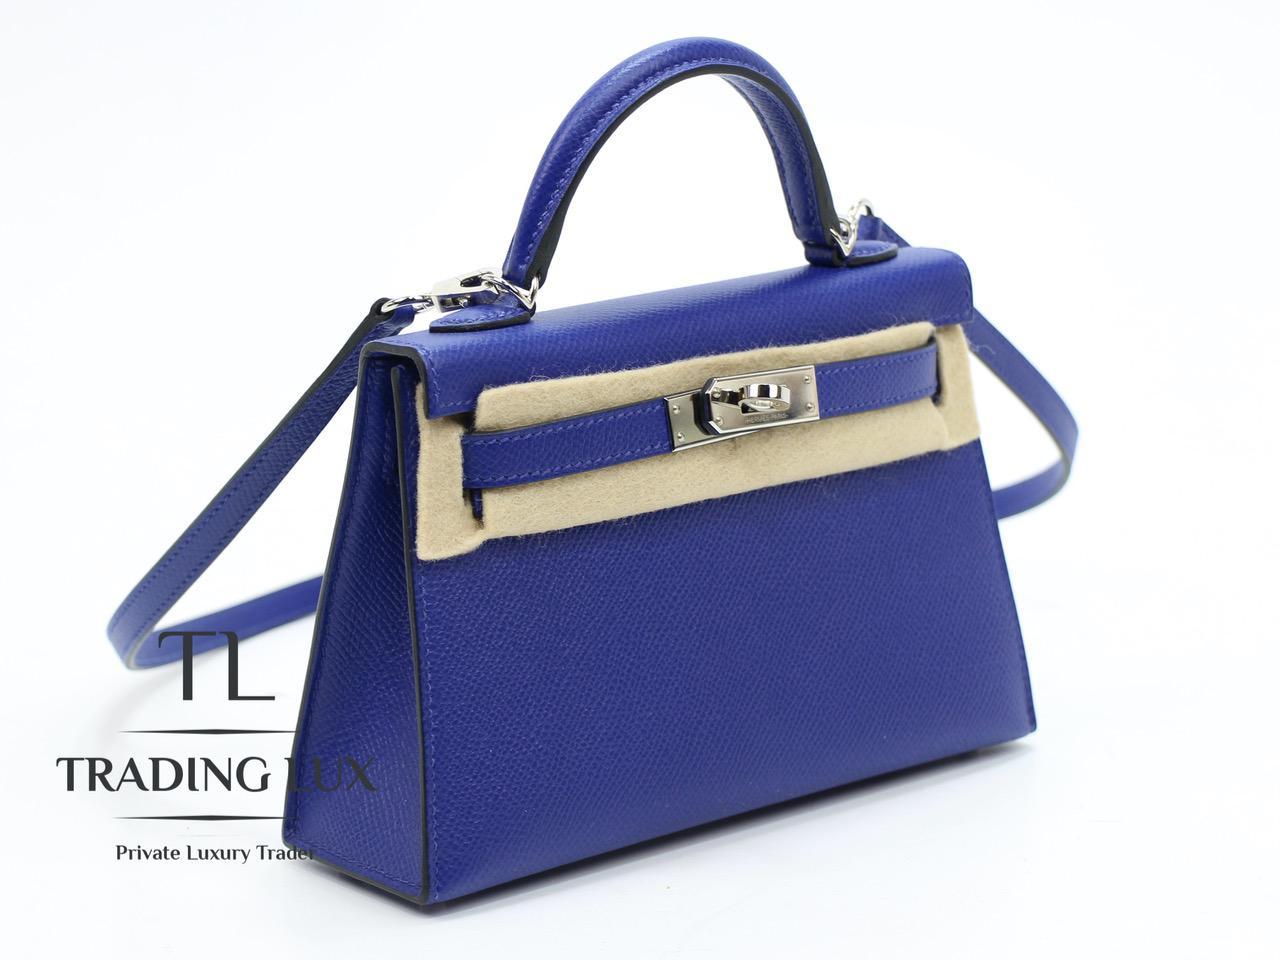 ermès-Mini-Kelly-20-Blue-Electric-1-1